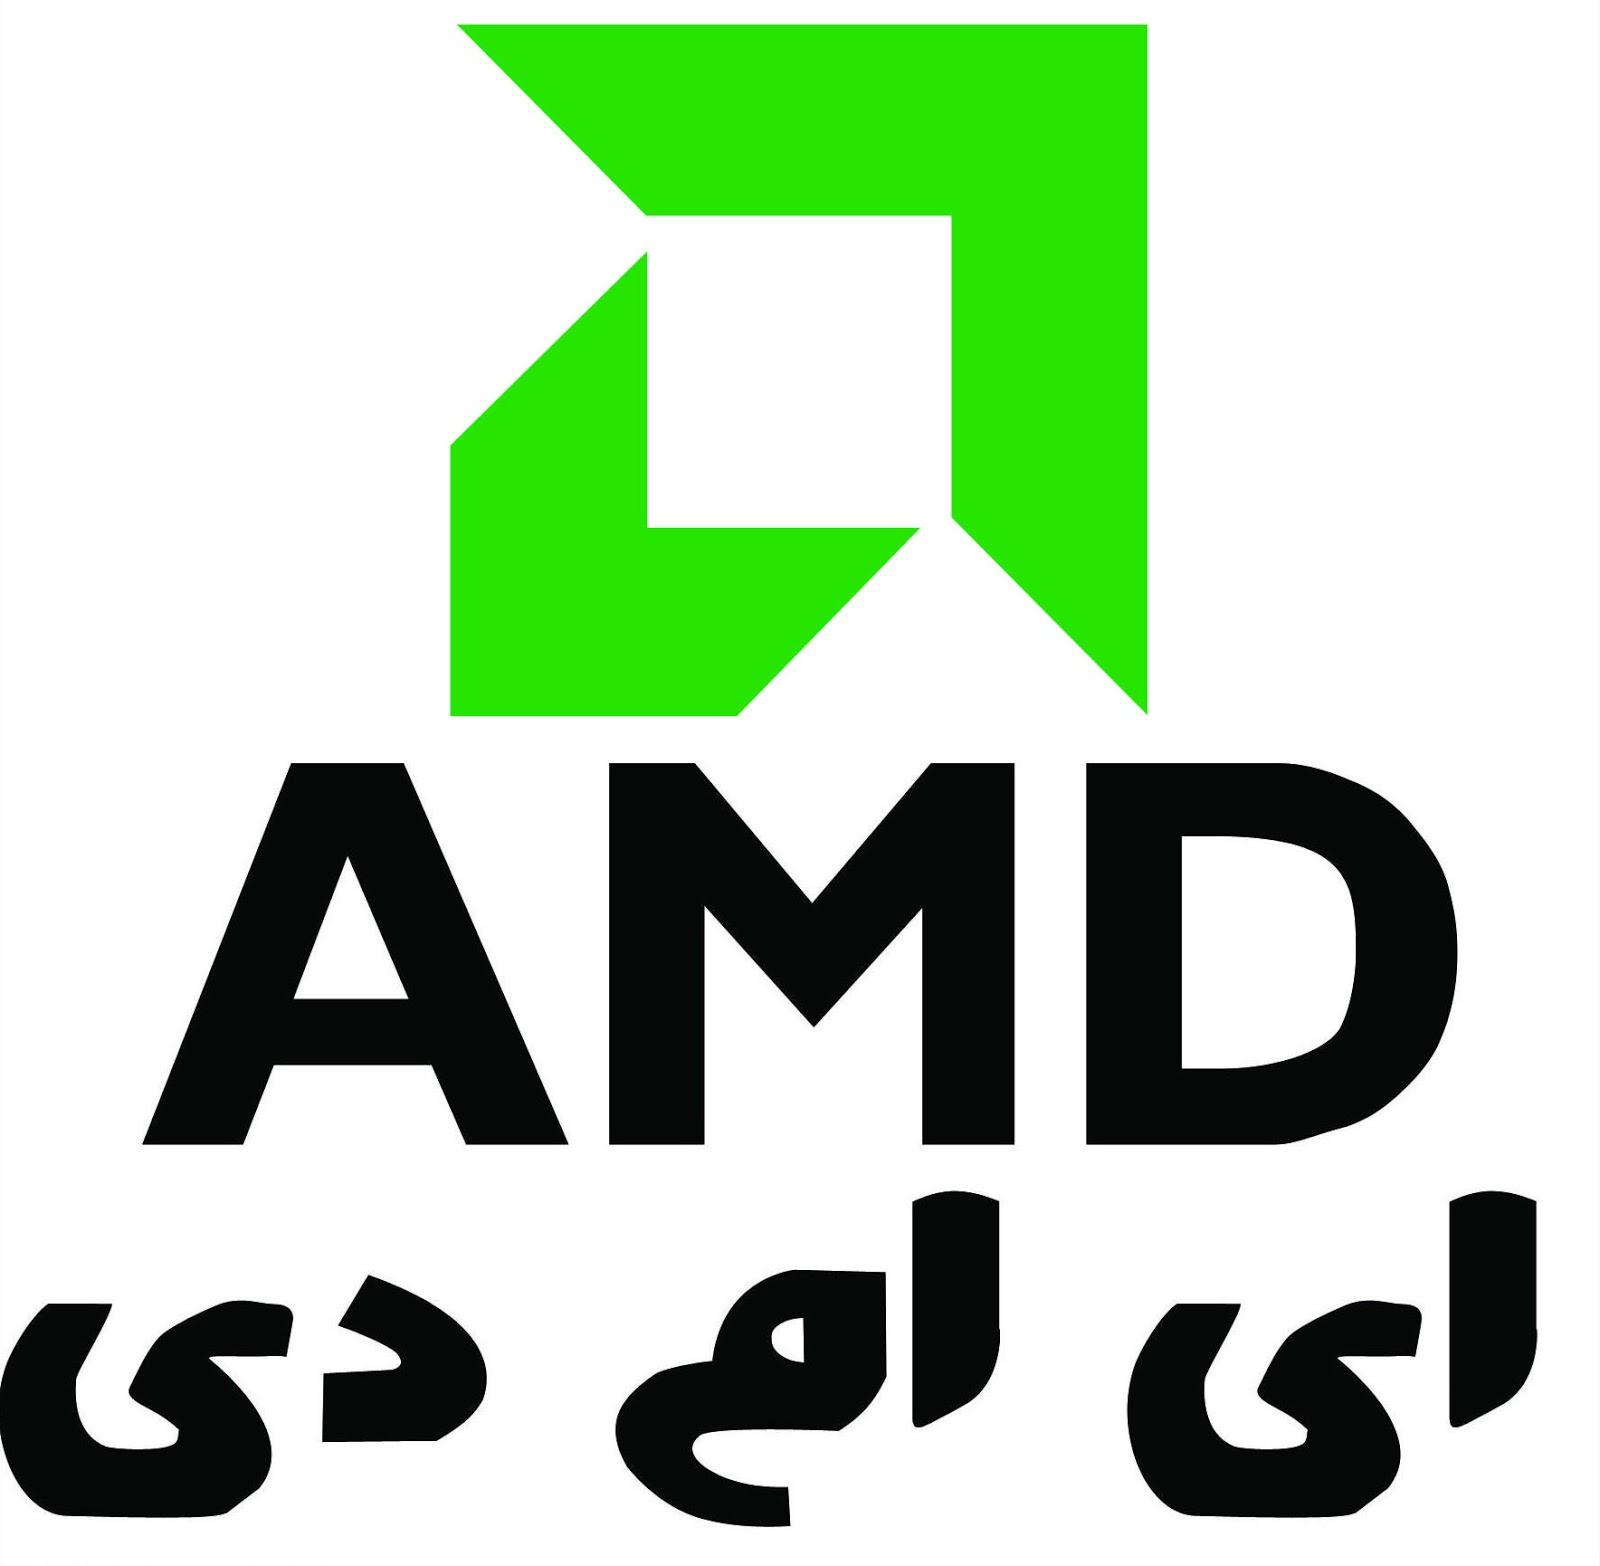 amd - photo #18